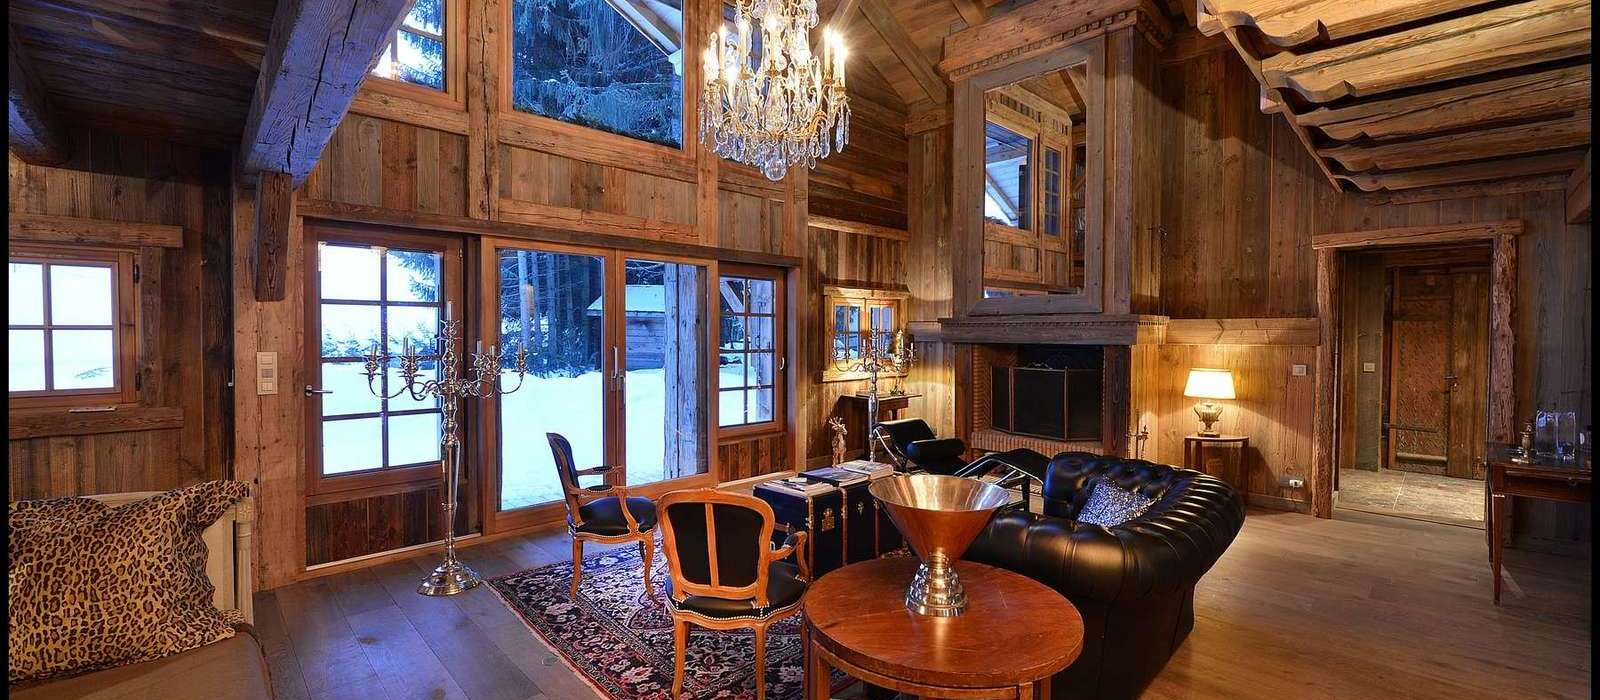 Ski Lodges with IVHE